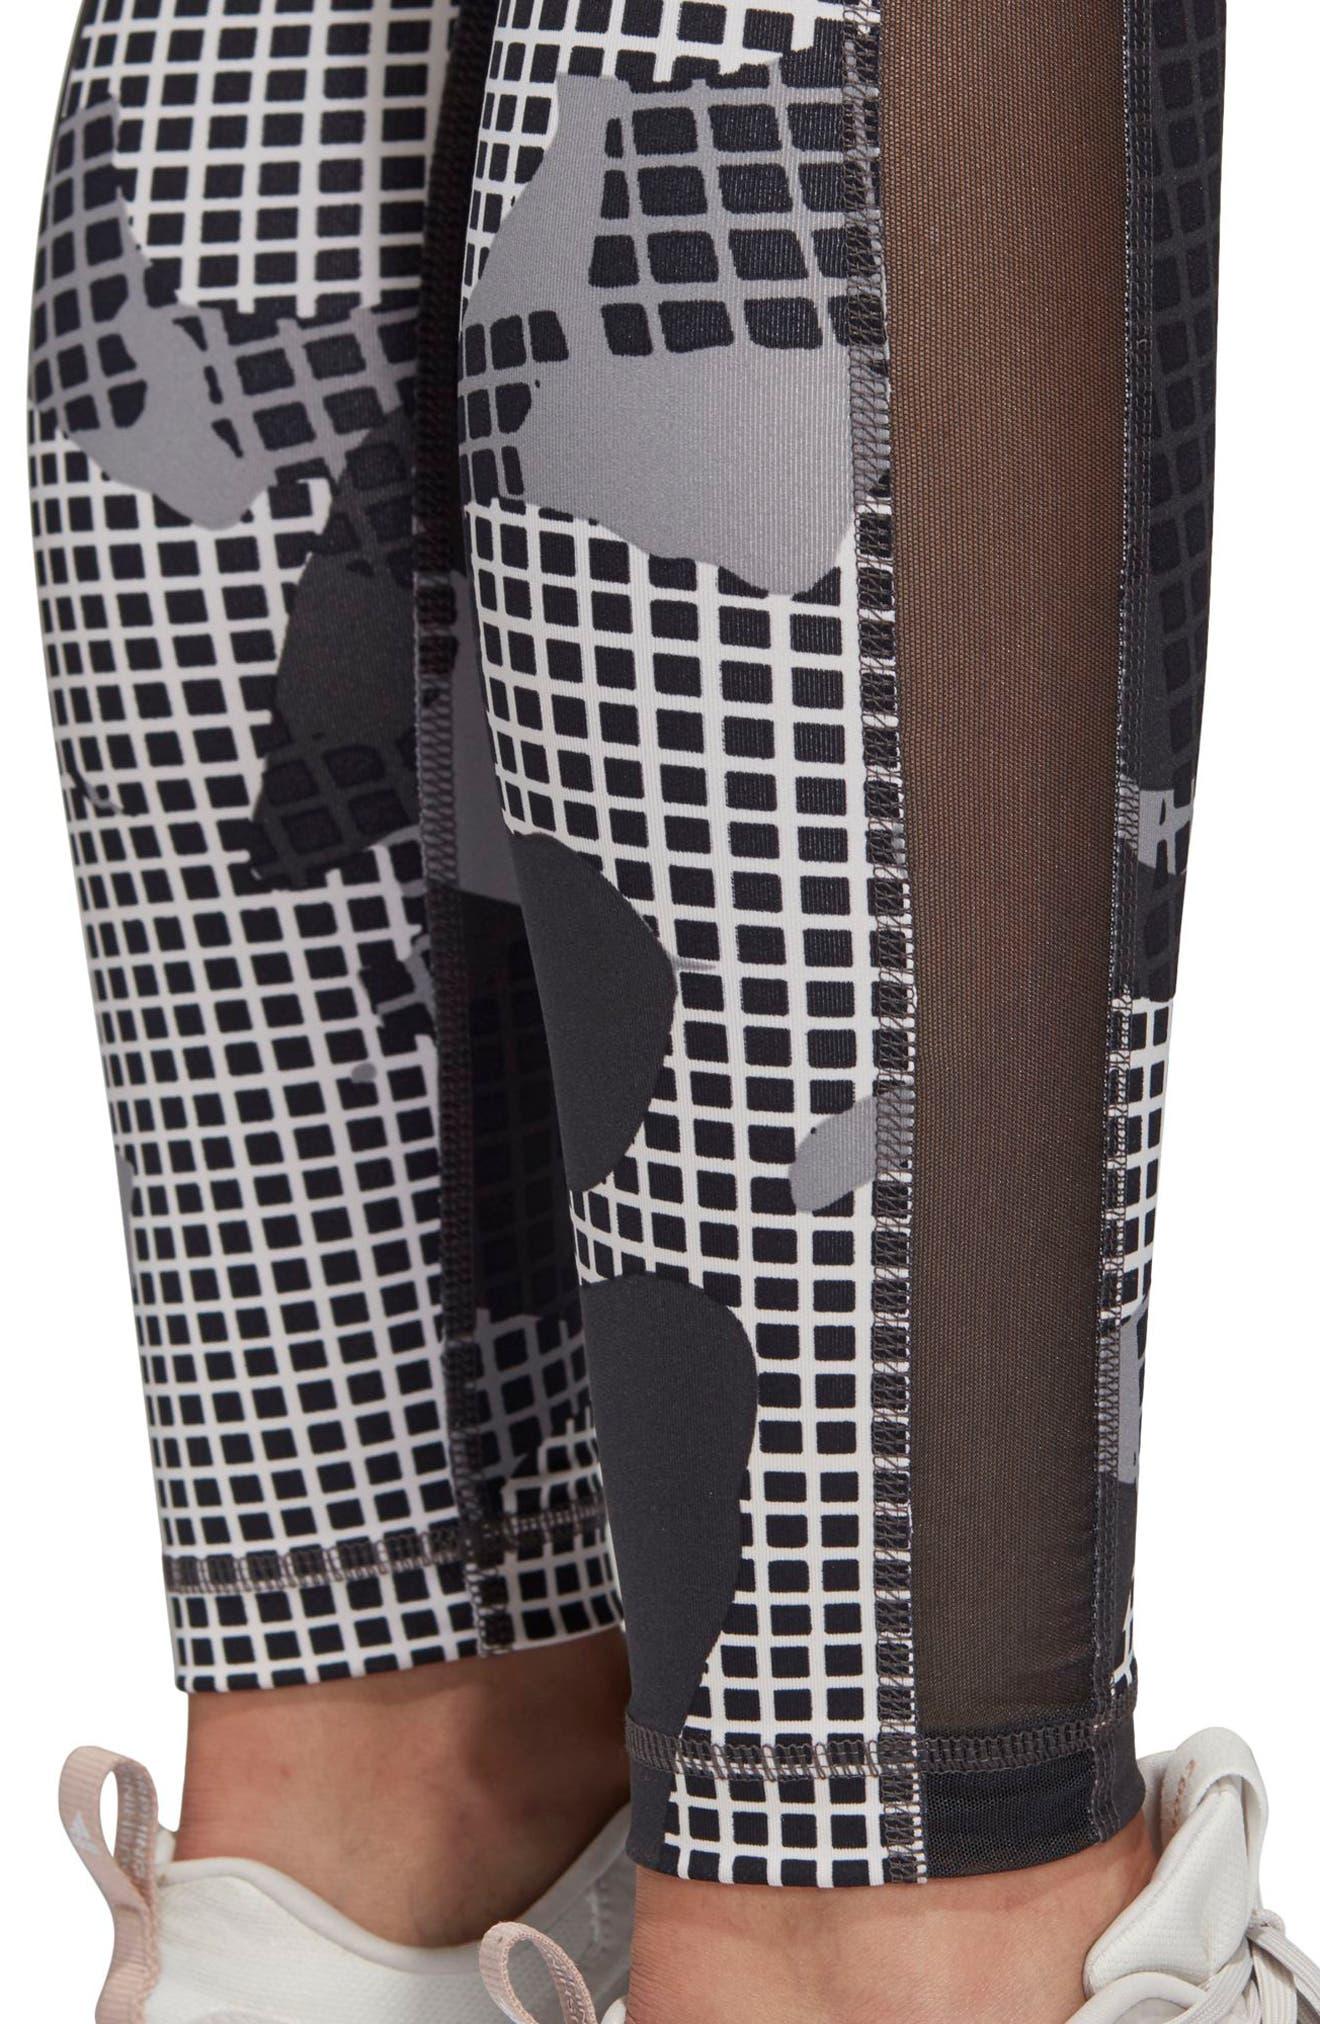 Heatracer Leggings,                             Alternate thumbnail 8, color,                             BLACK/ PRINT